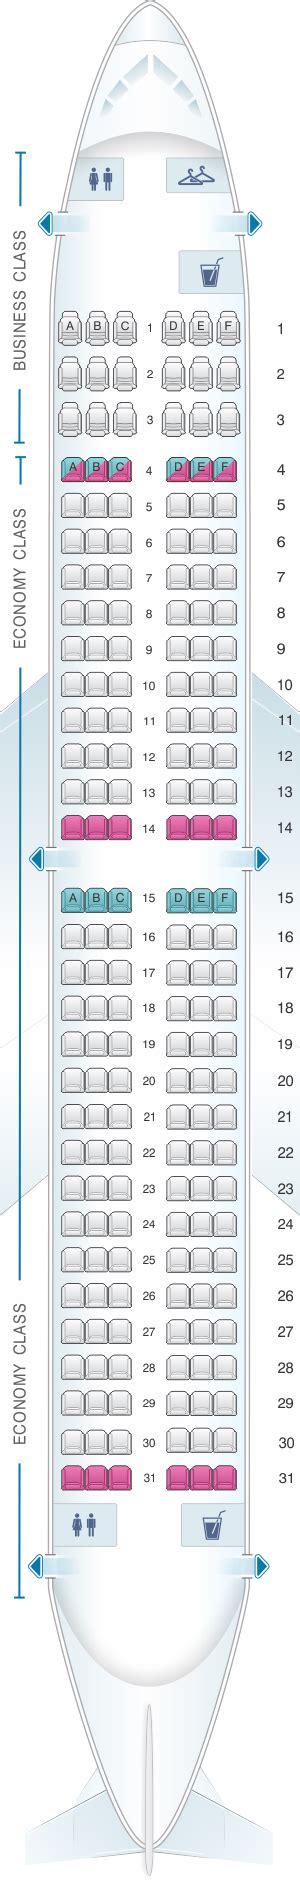 plan des sieges airbus a320 plan de cabine air europa boeing b737 800 seatmaestro fr